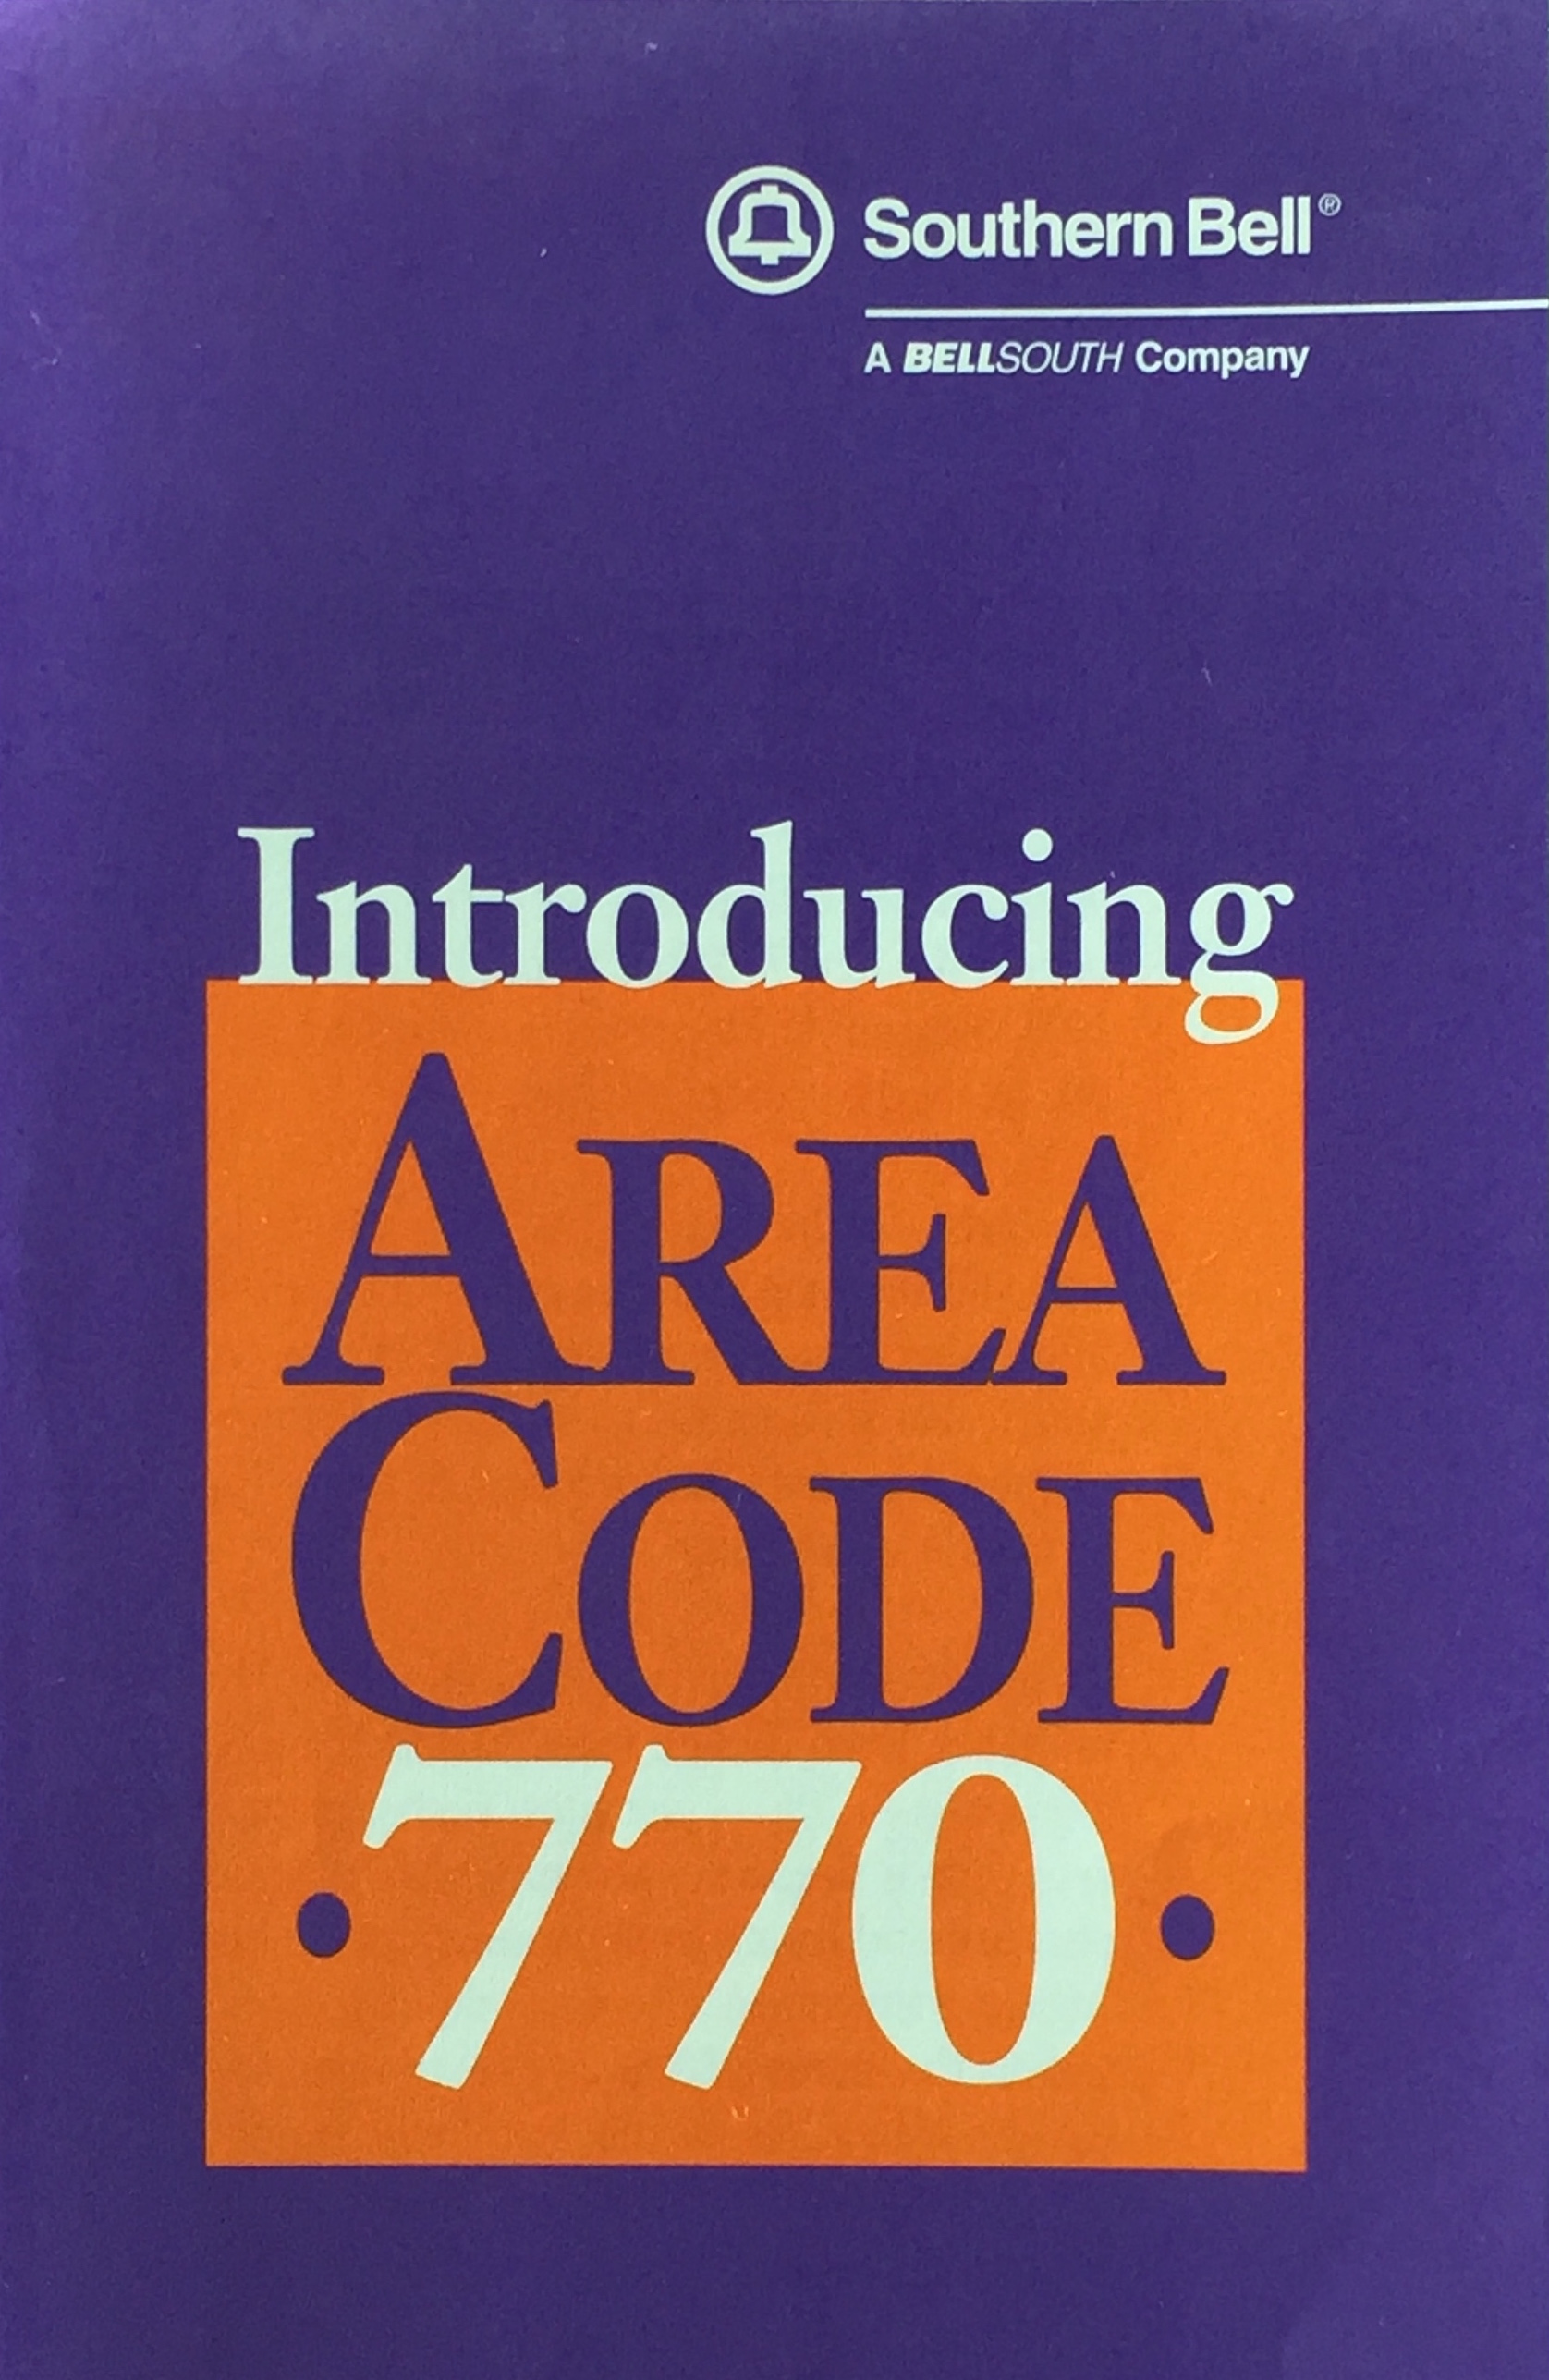 1995_Area_770.jpg